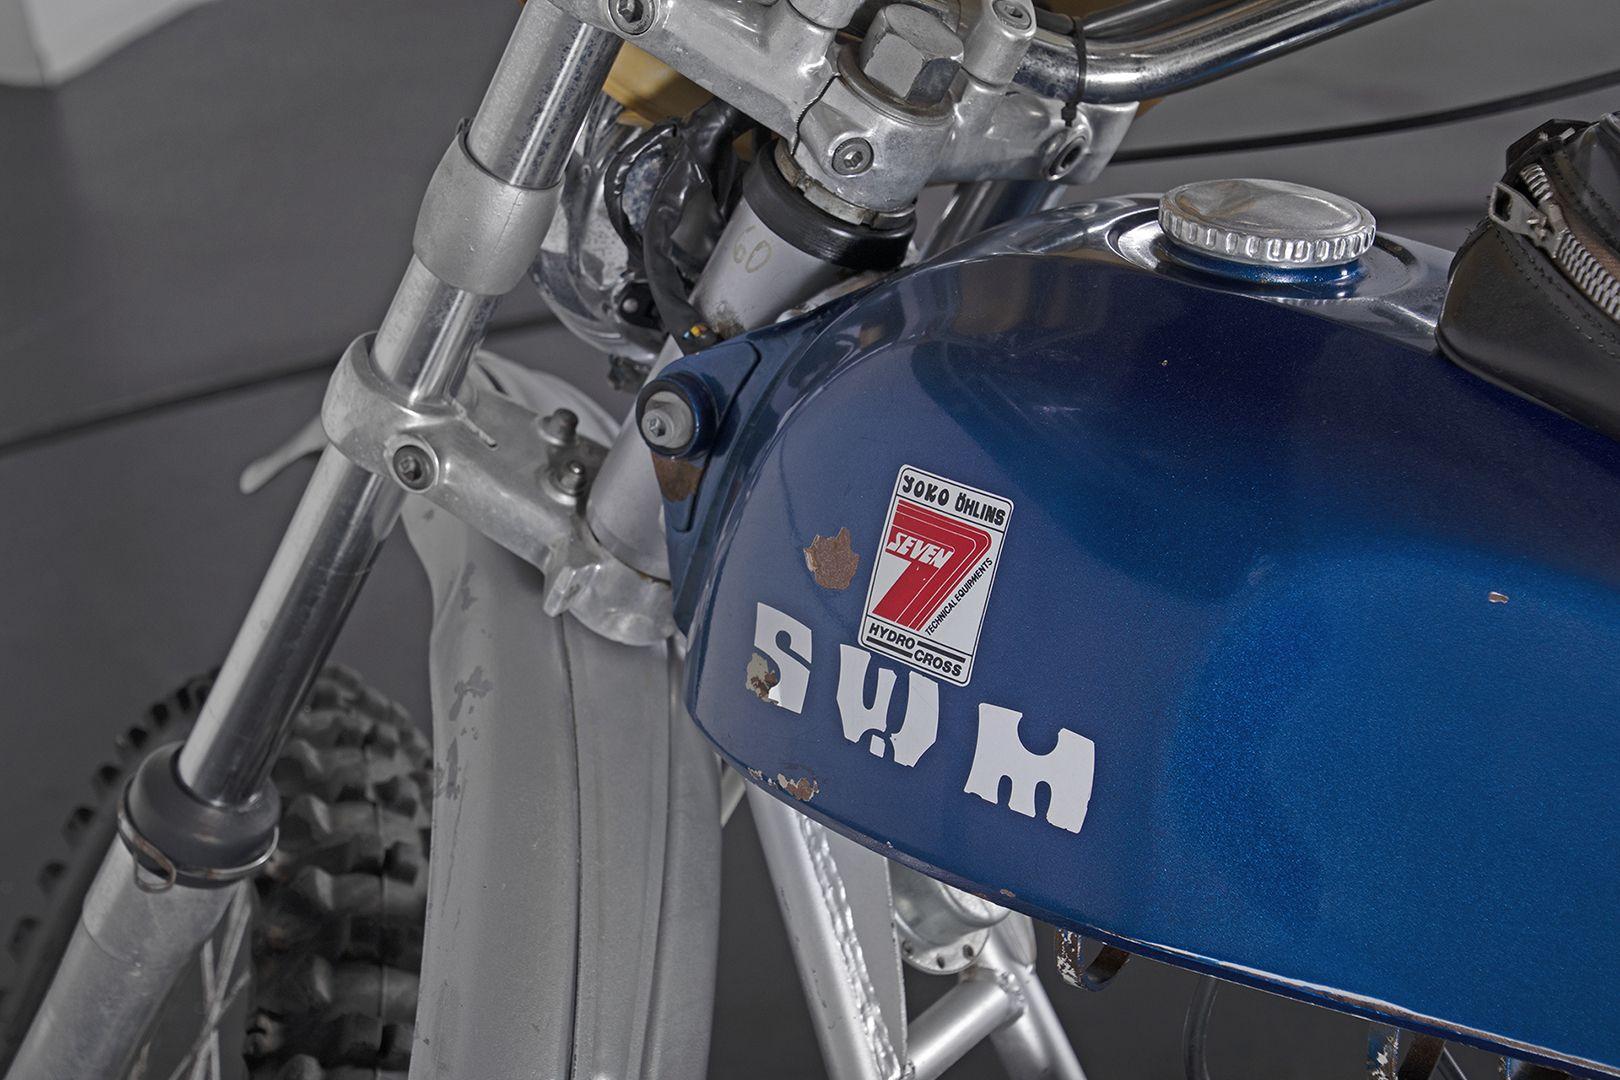 1974 SWM 125 53199